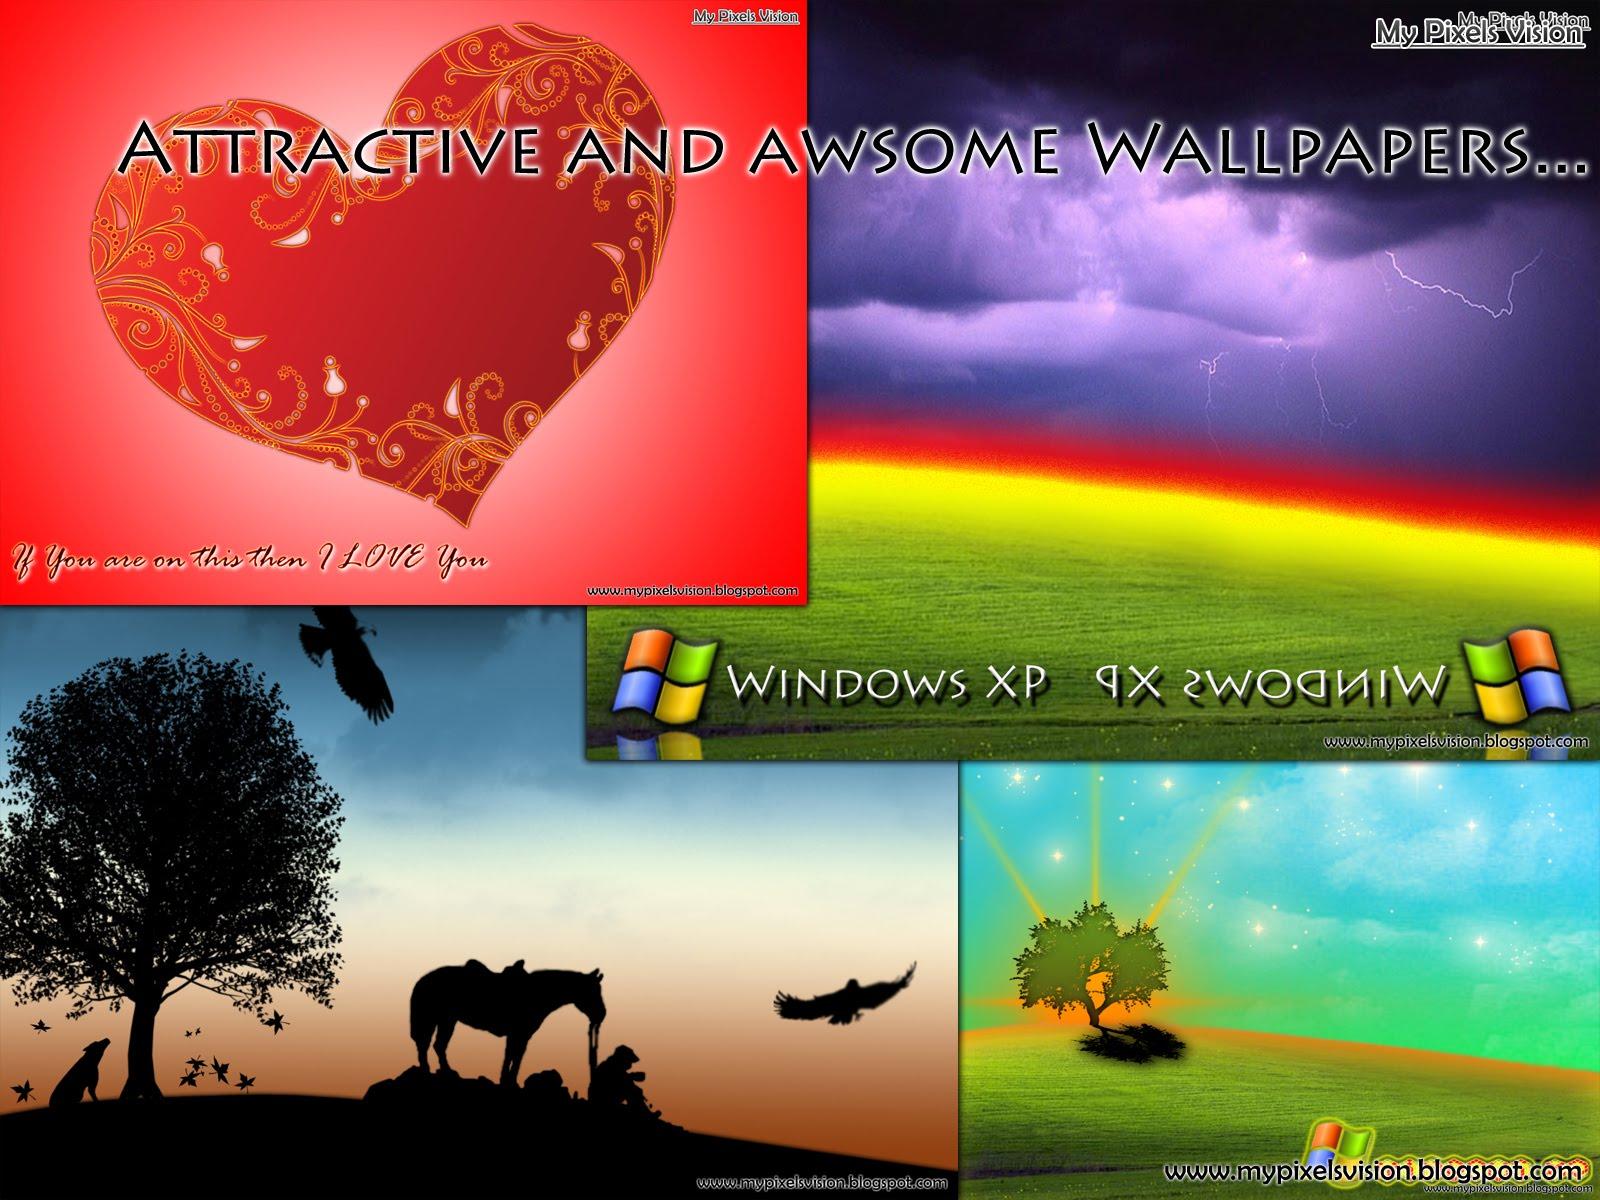 http://3.bp.blogspot.com/_CRN5eezs21I/TFOQ54Tq9cI/AAAAAAAAAG4/qFmmIiZelU8/s1600/Attractive%2Band%2BAwsome%2BWallpapers.jpg